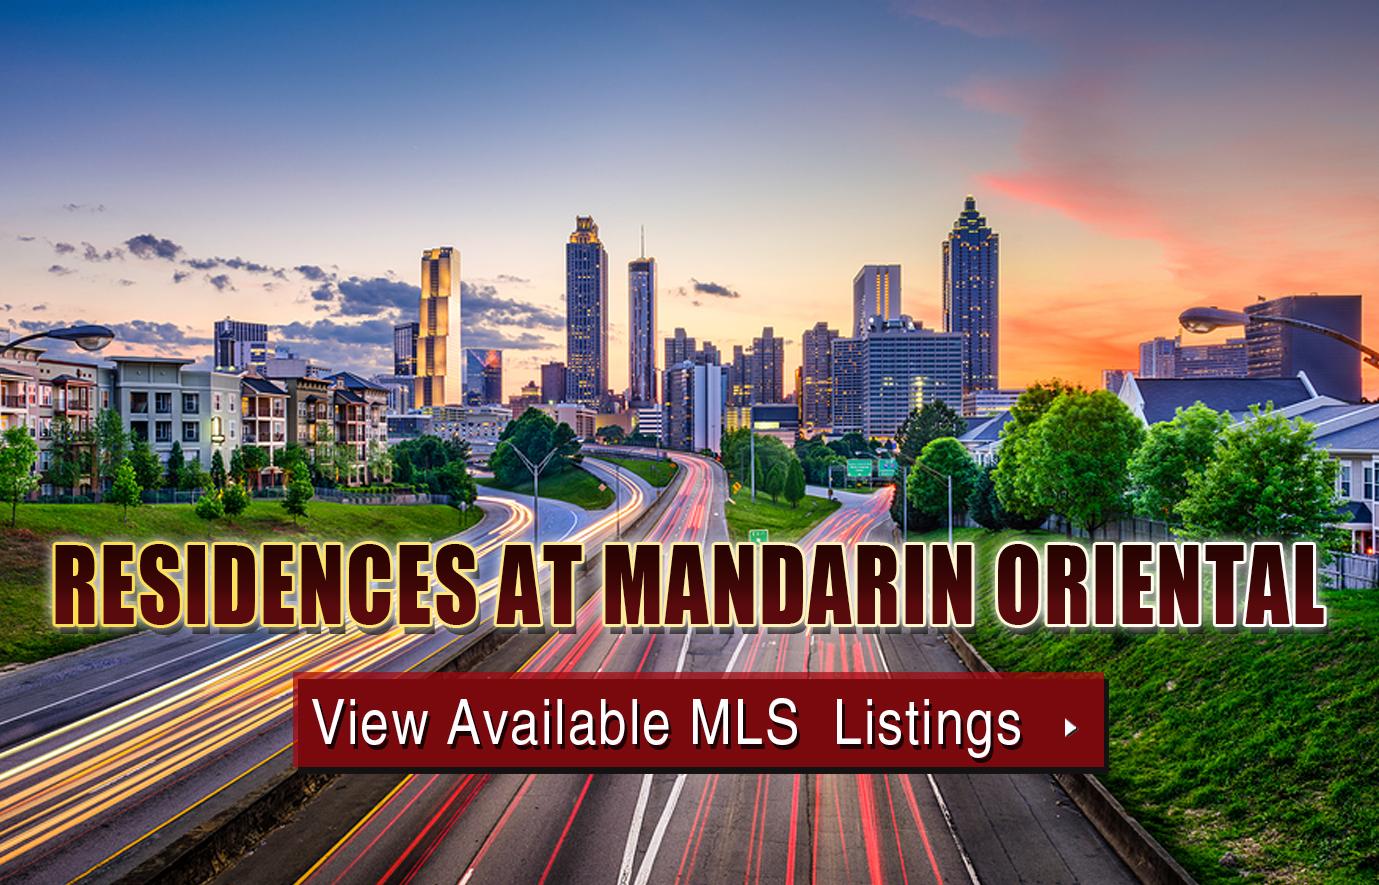 Residences at Mandarin Oriental Condos For Sale